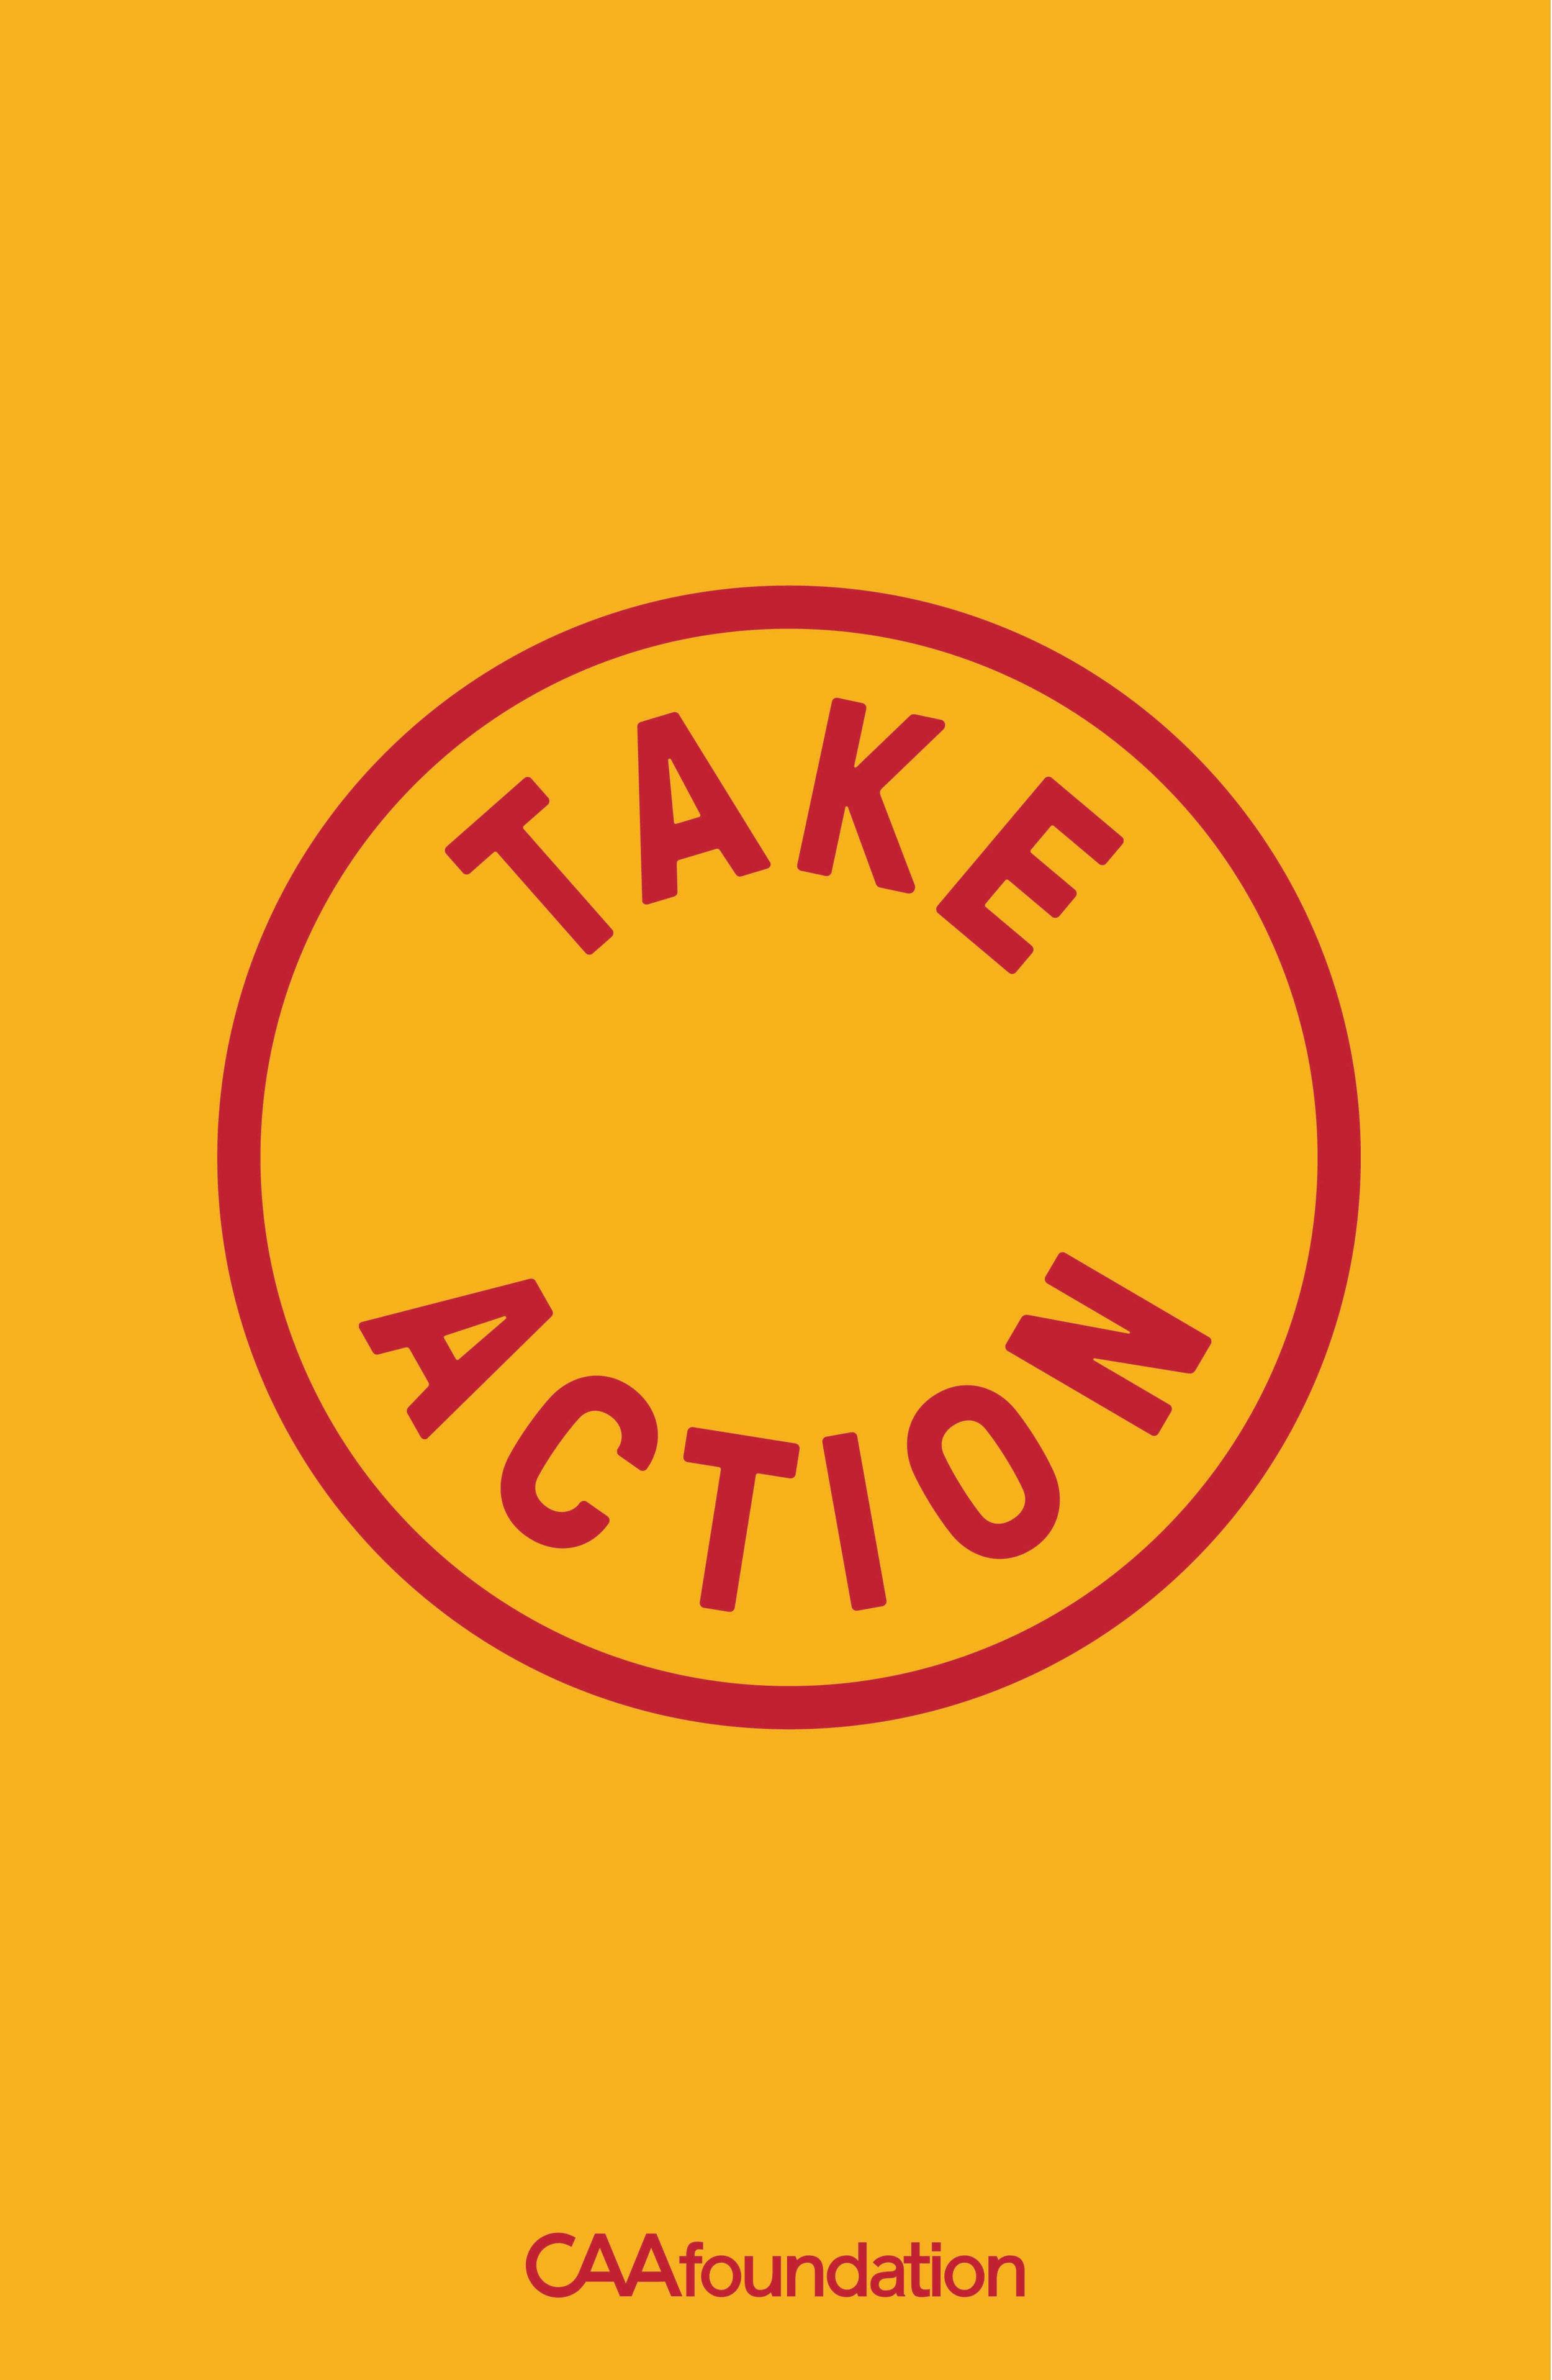 Take_Action_Posters_v5-12.jpg